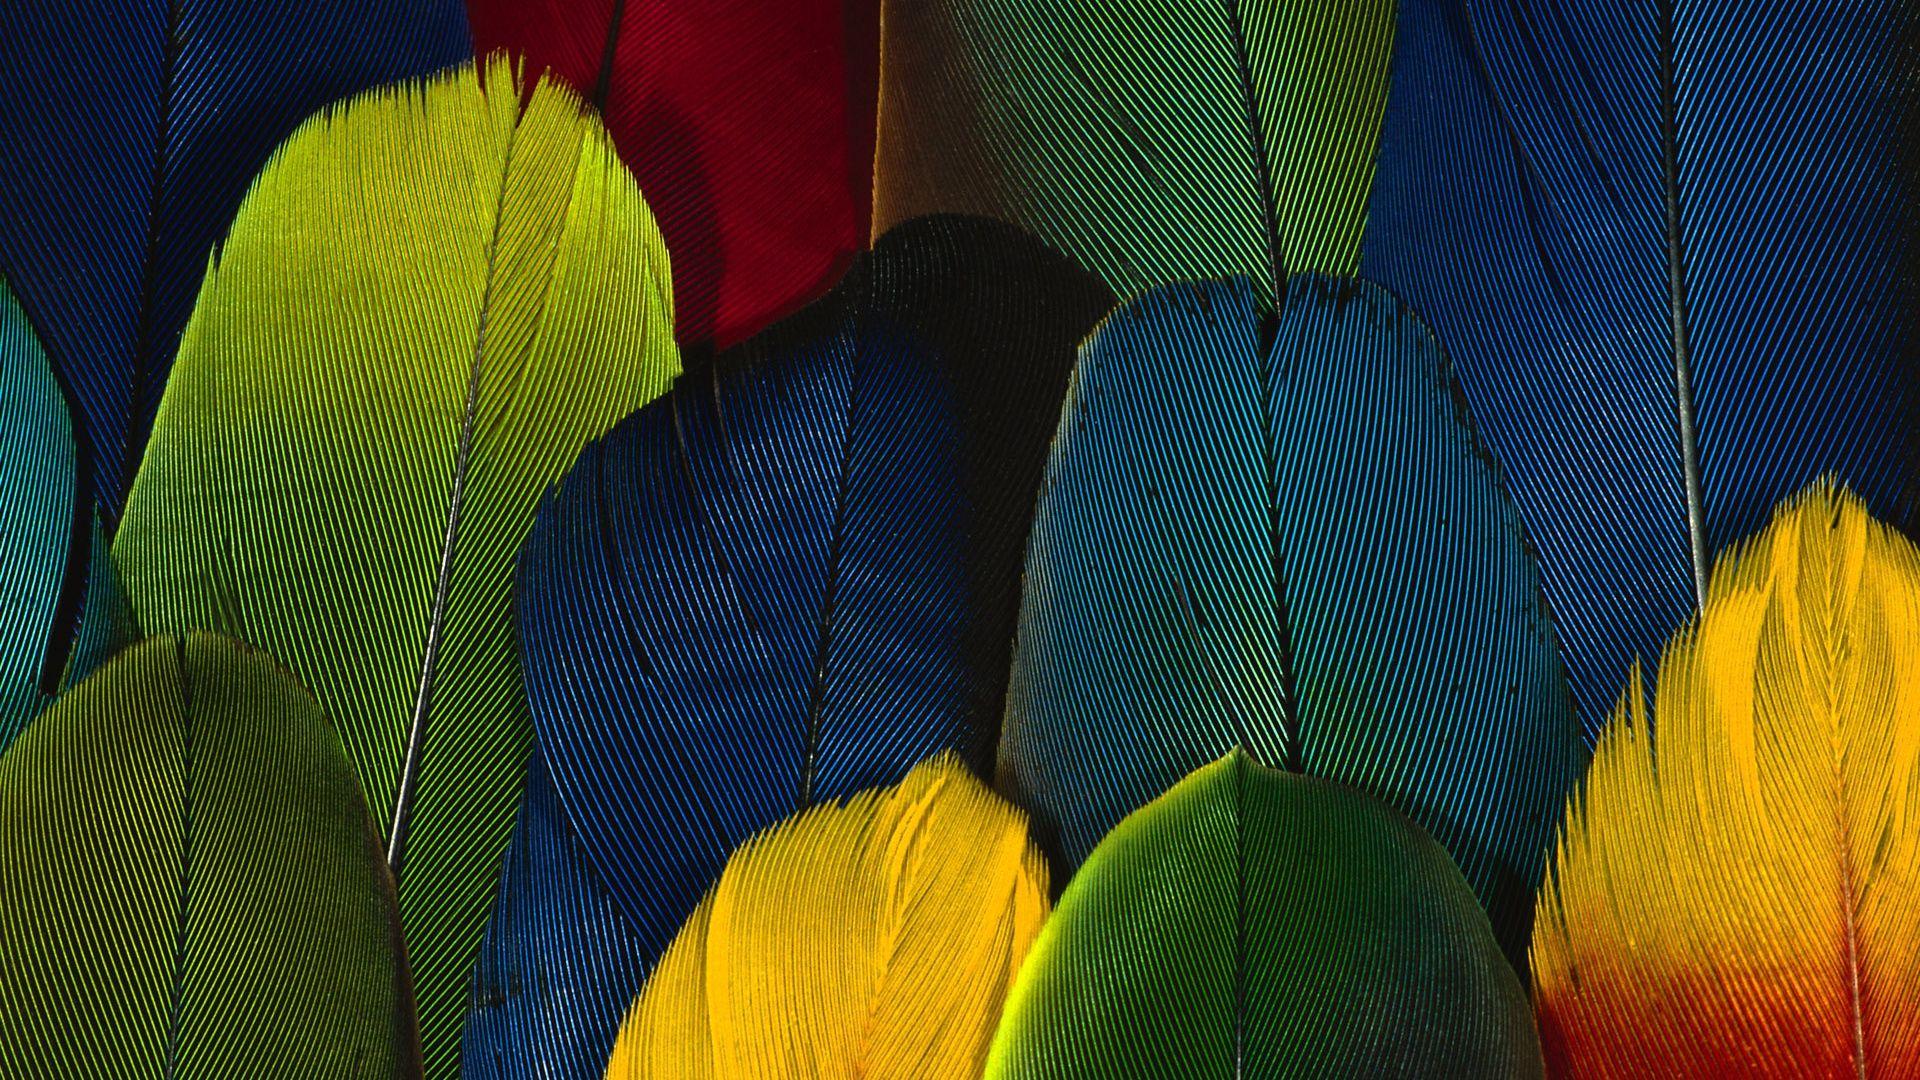 Feather Bloom desktop image